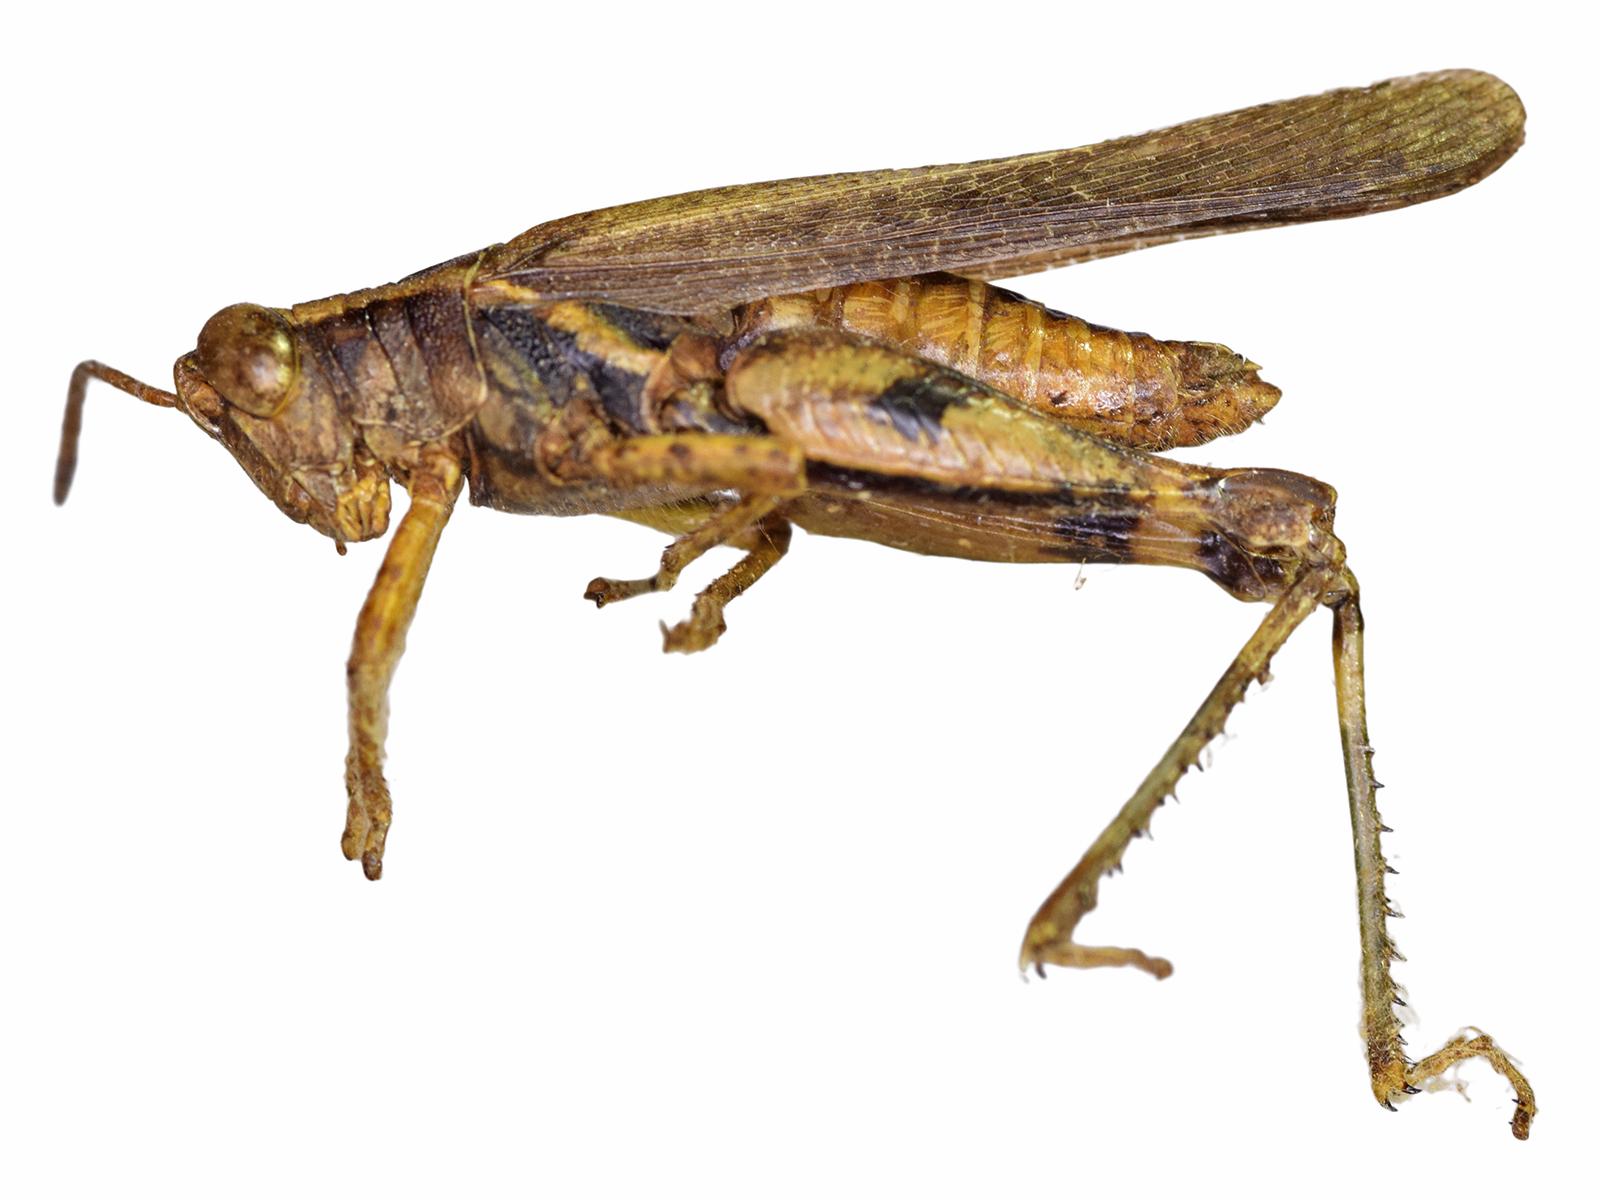 Omalotettixobliquus(Thunberg, 1824)